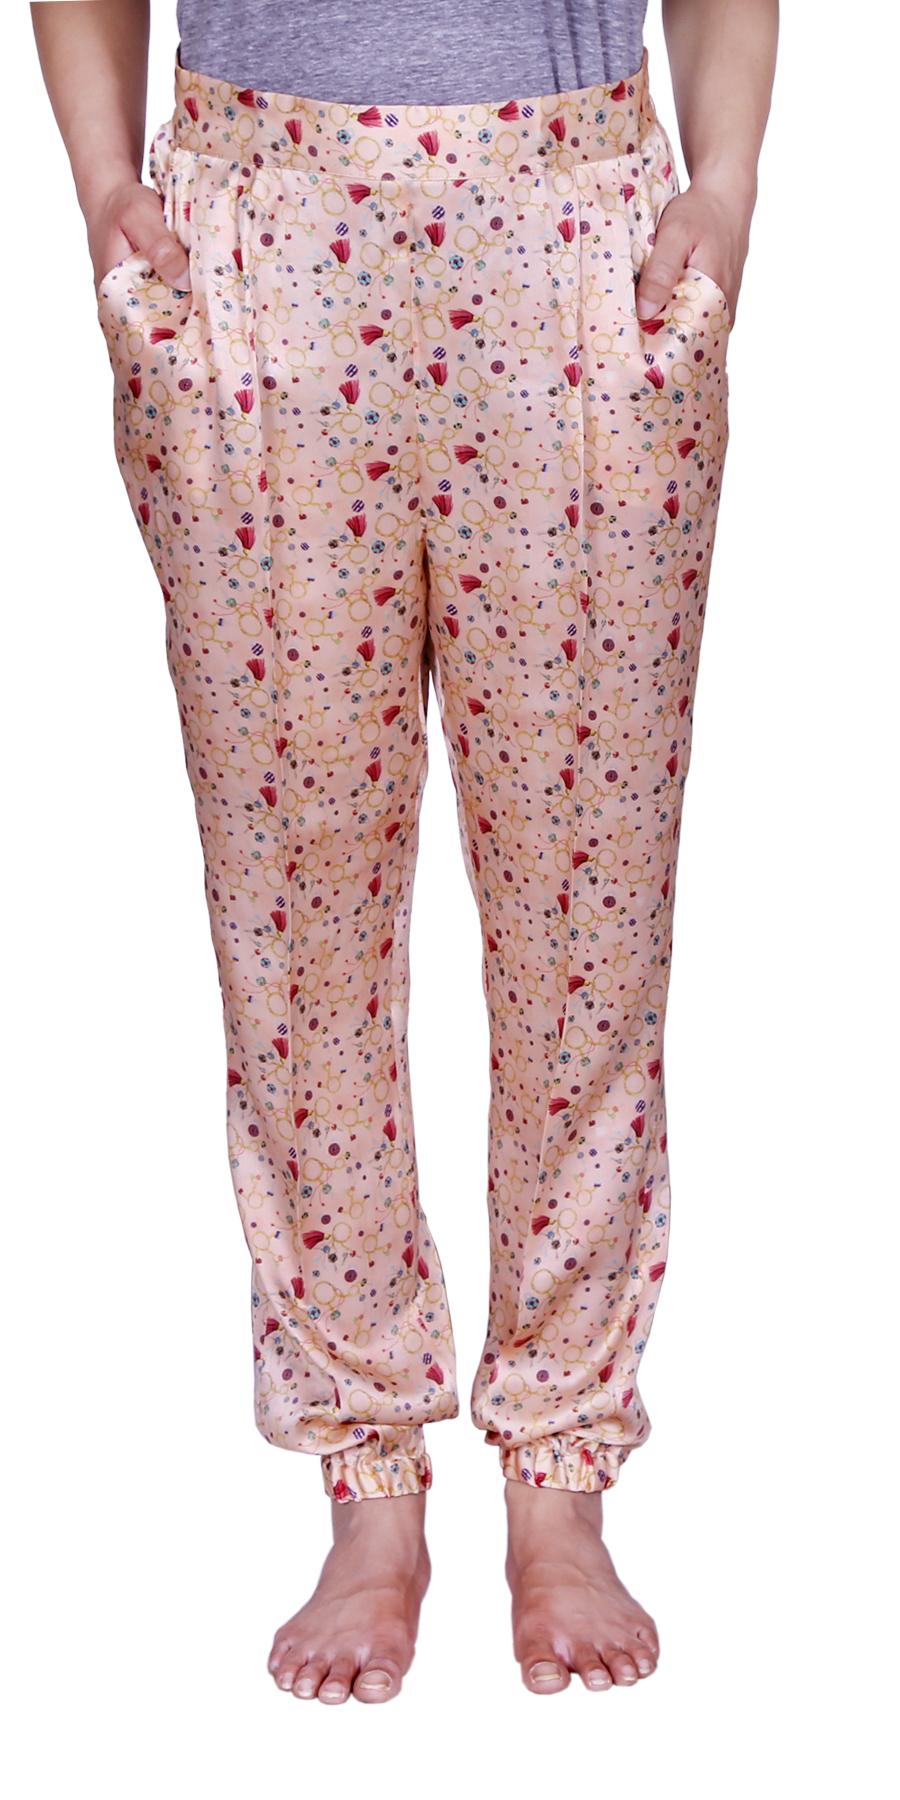 HERMOSA JOGGER PANTS